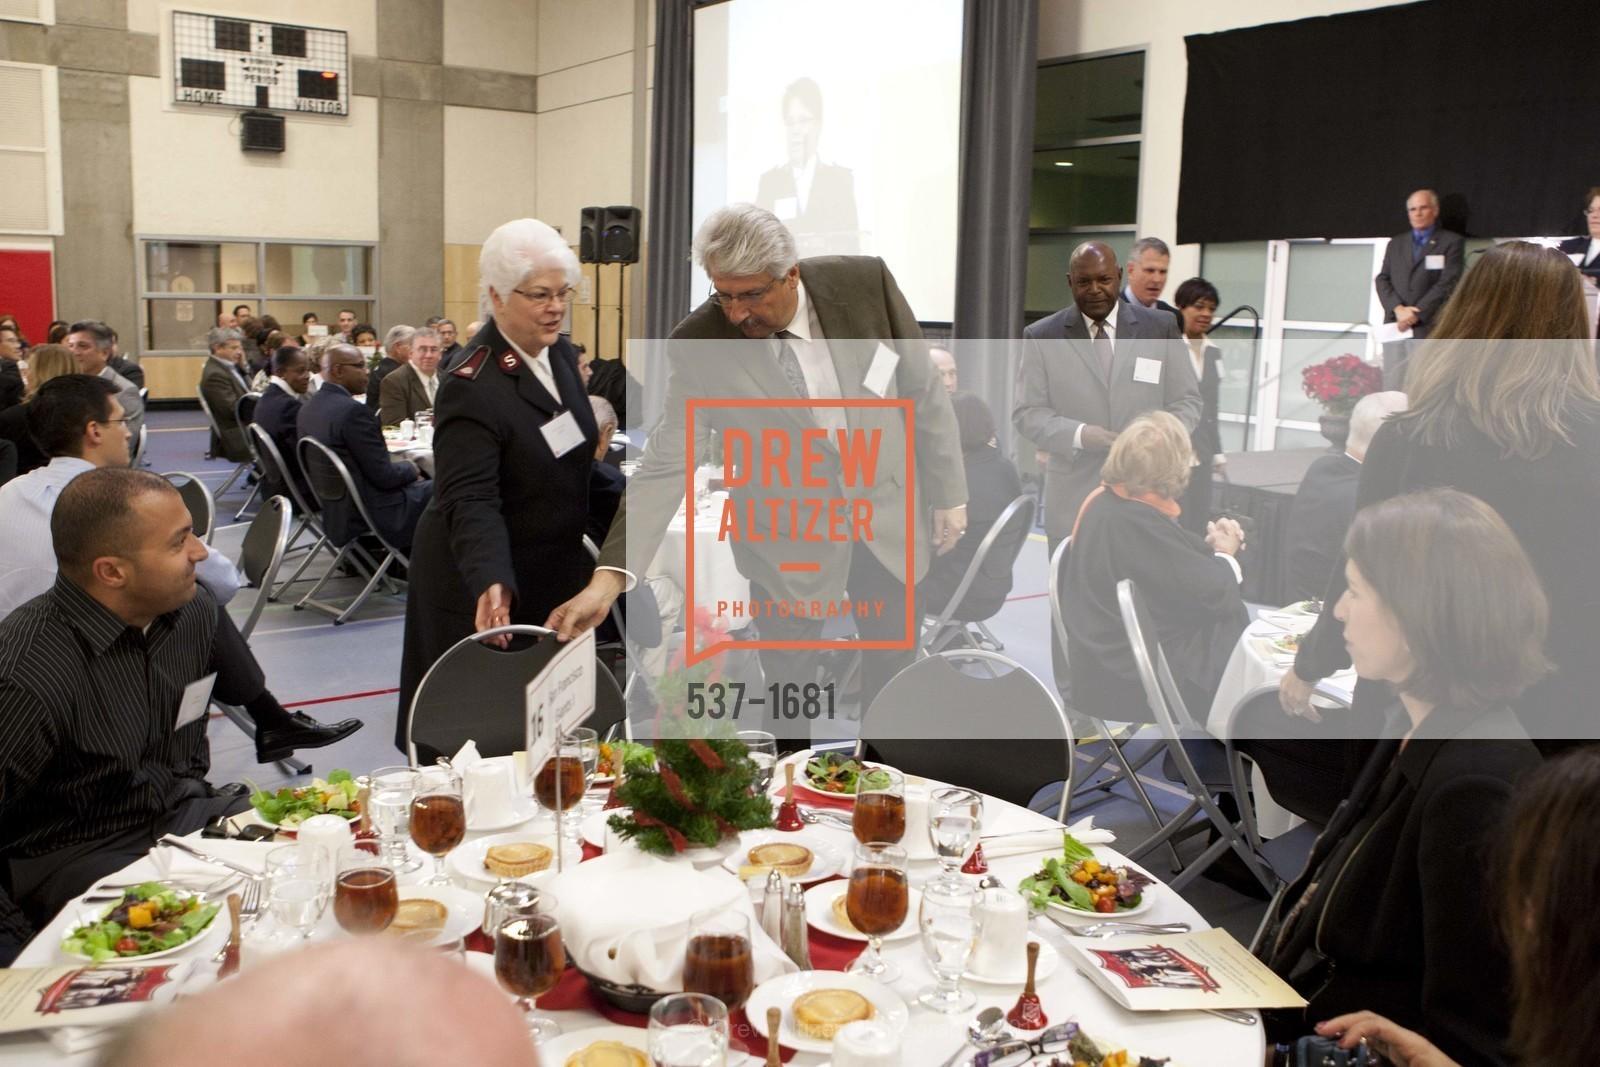 Lt. Col Judy Smith, Bill Laskey, Photo #537-1681